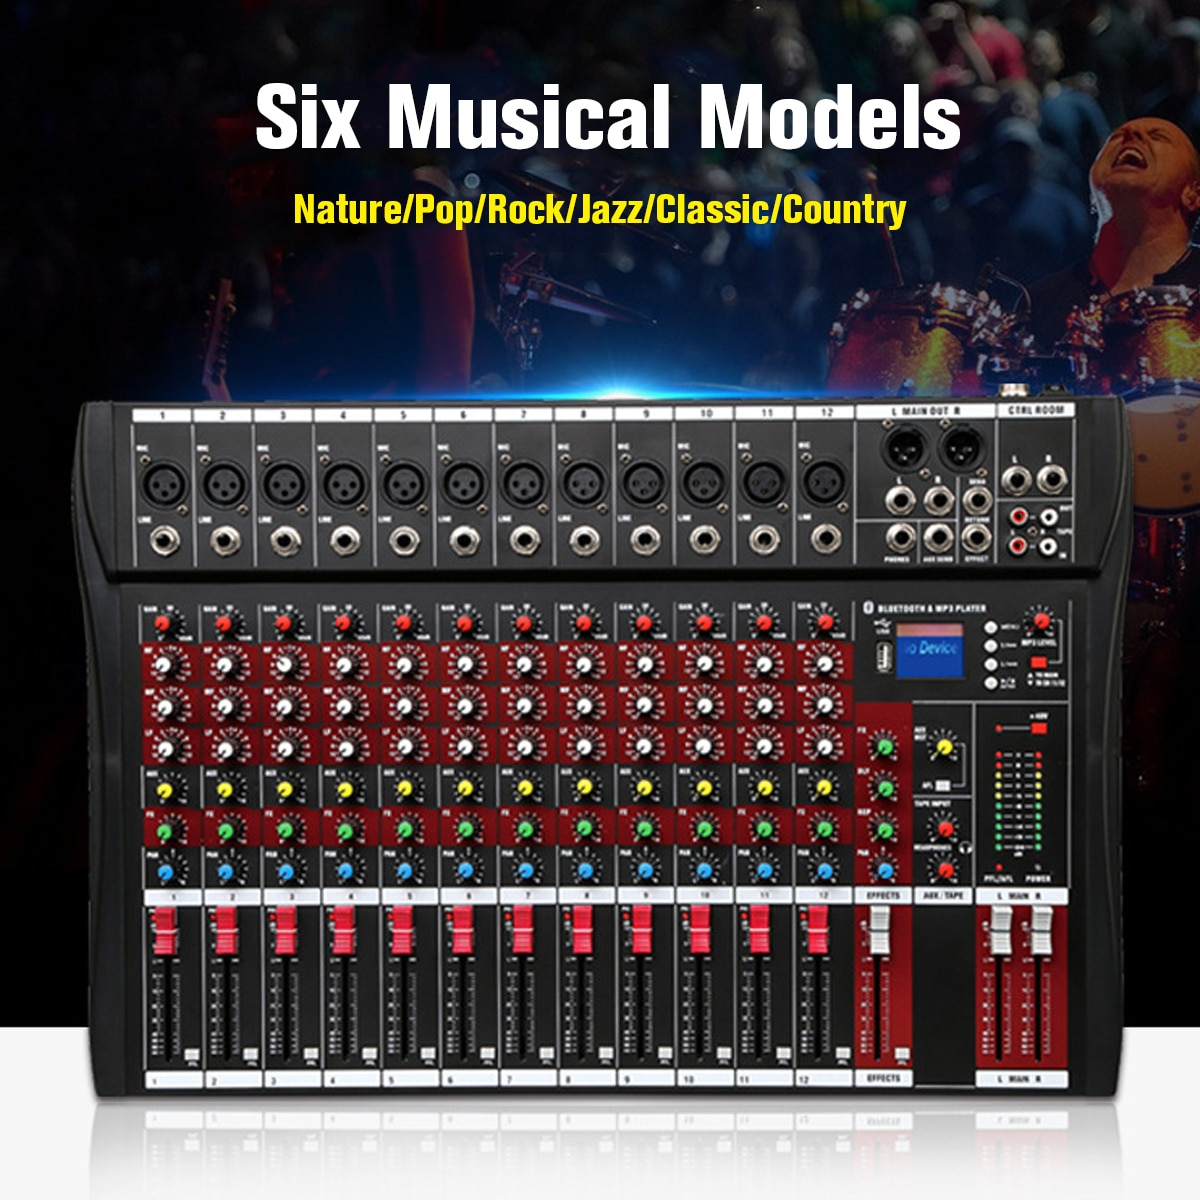 Mezclador de Audio 48V con USB profesional 12 canales bluetooth Studio DJ consola mezcladora Karaoke amplificador Digital KTV mezclador de sonido